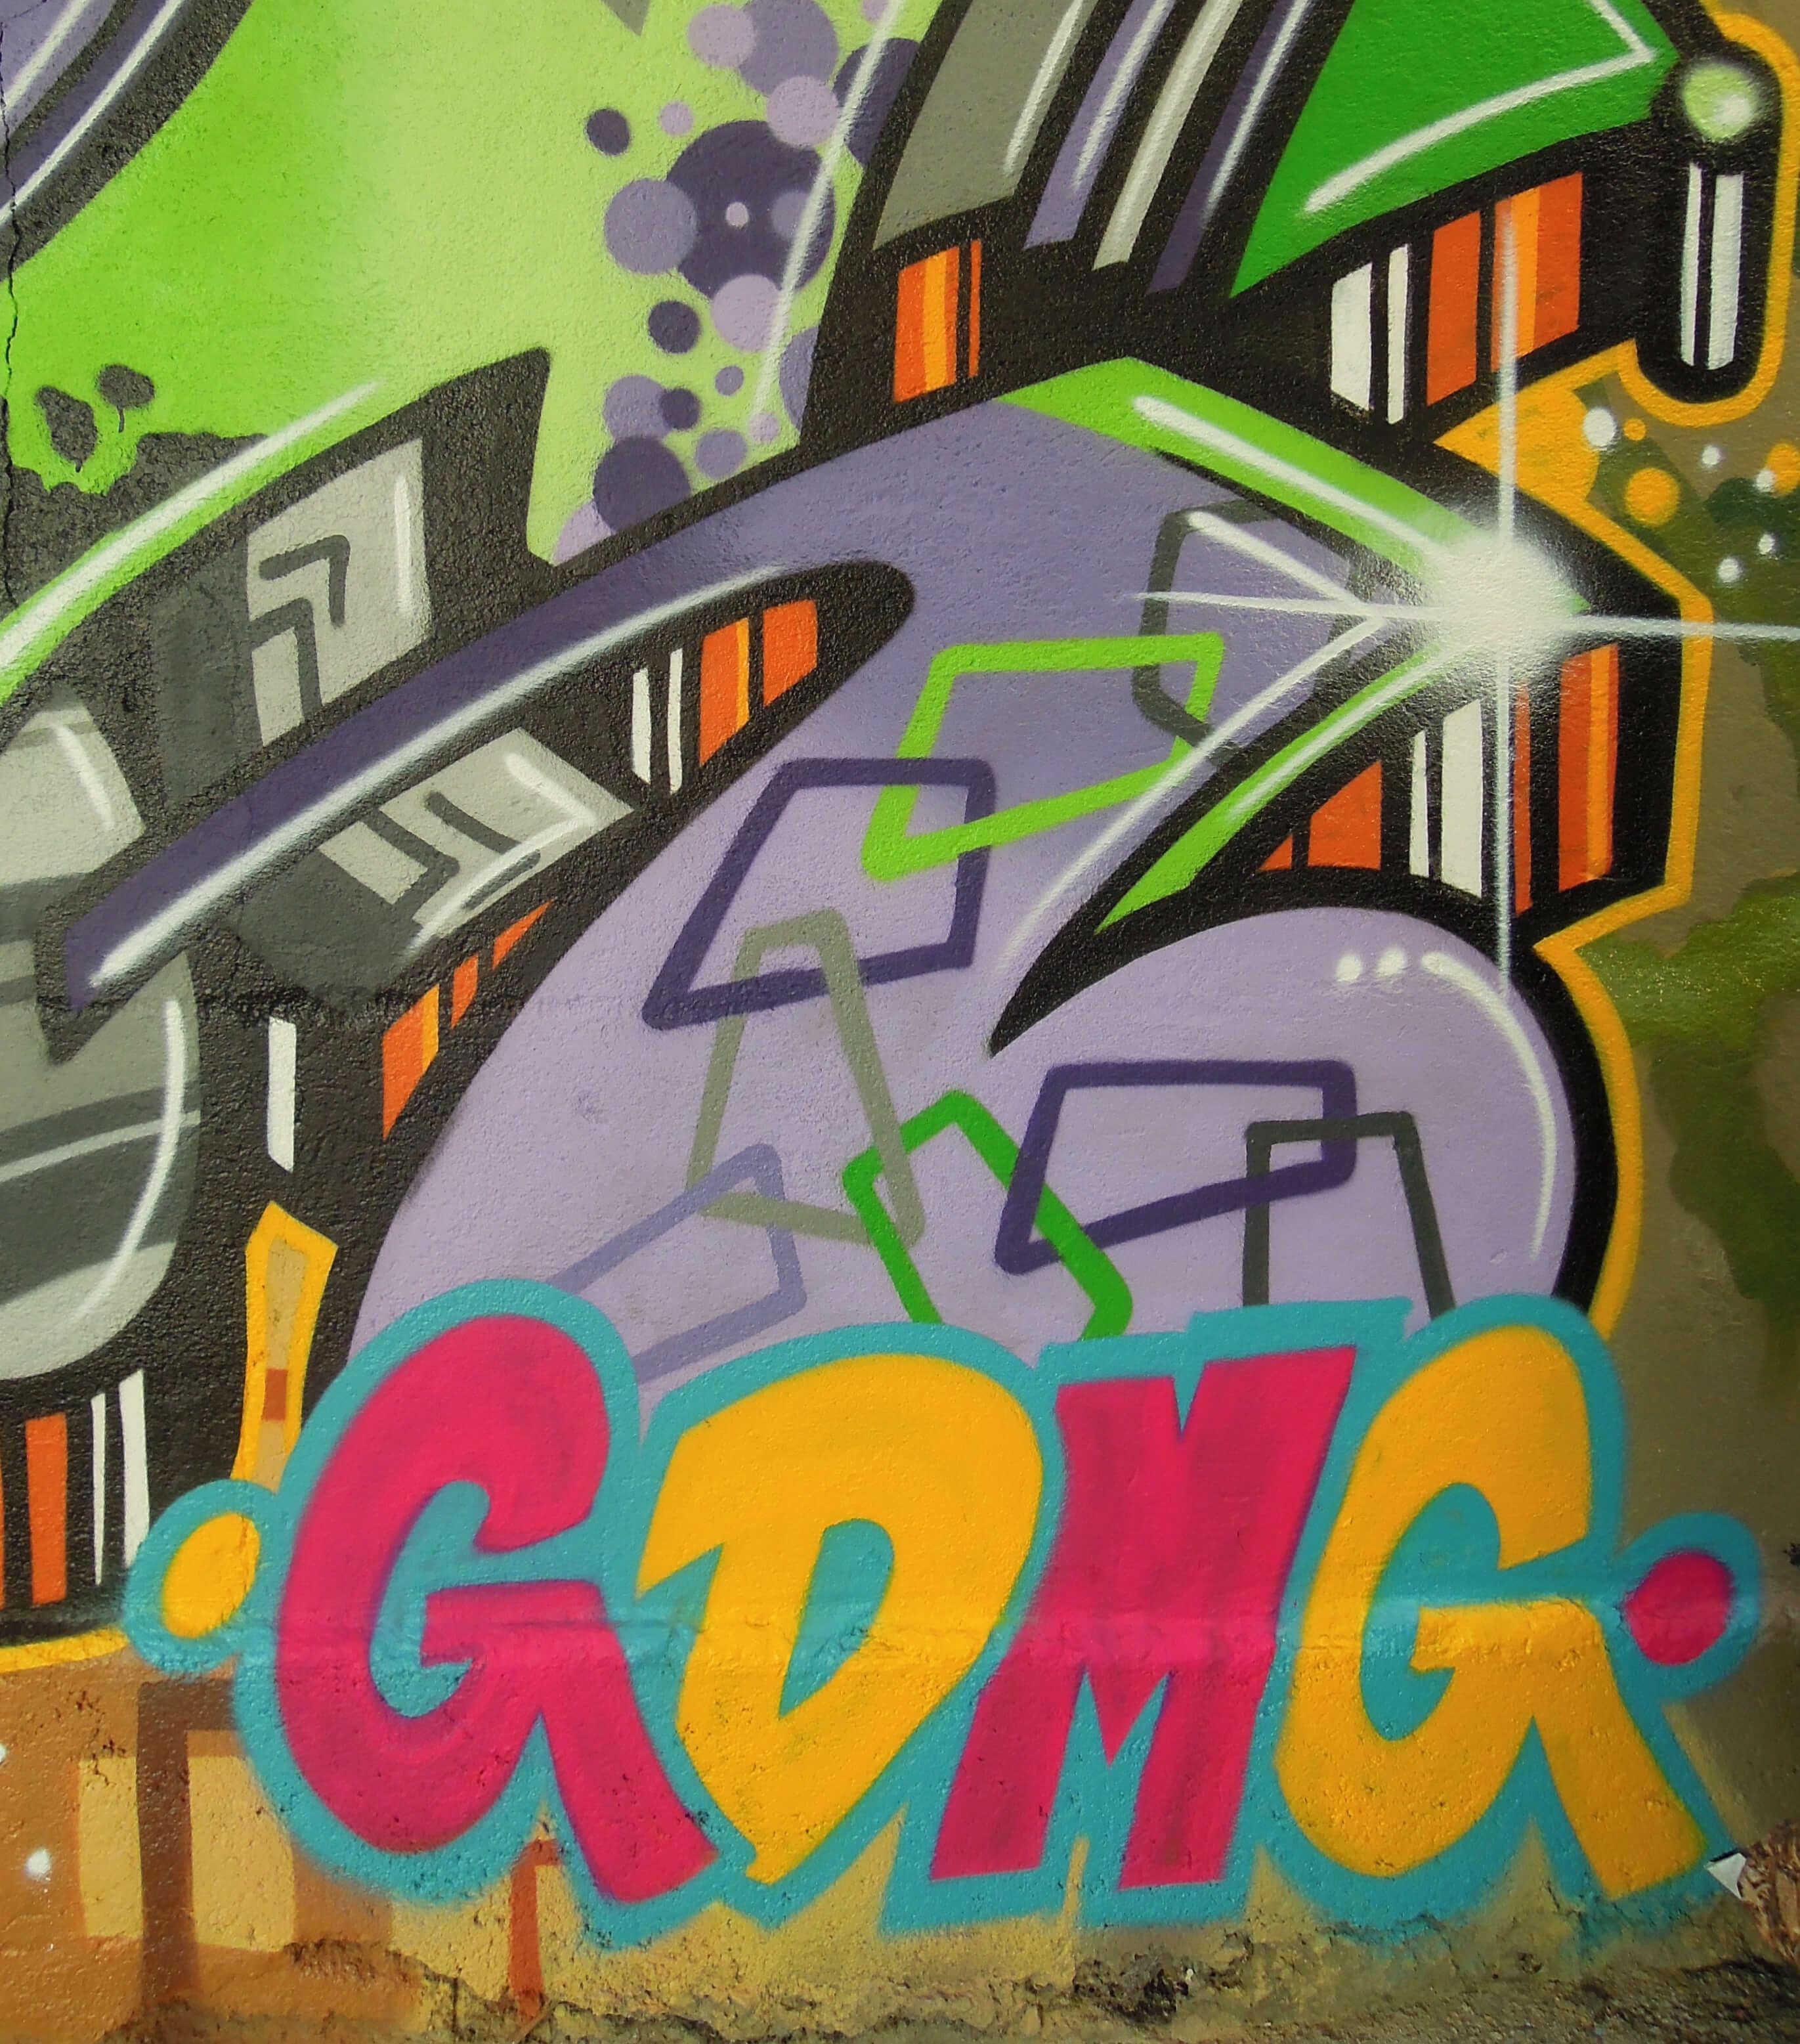 GDMG. Kunst und so - Grüß dich mei Guder. Street Art. Graffiti Coburg. JDE TDN CSW GDMG!